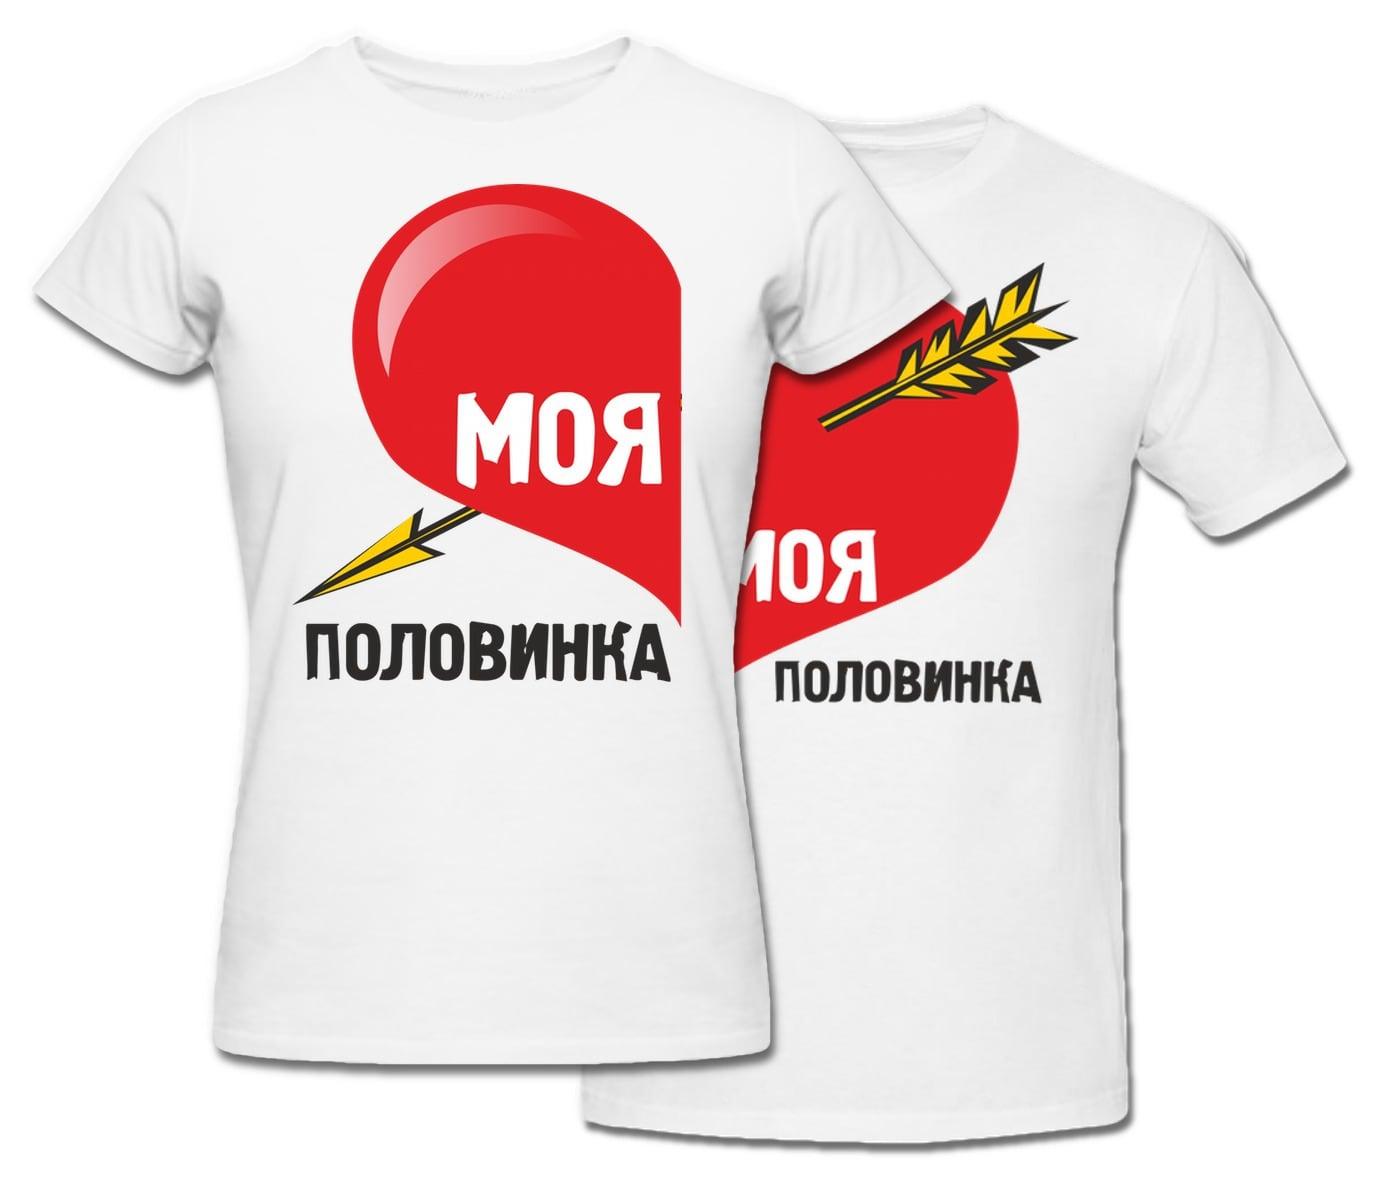 Комплект футболок *Моя половинка*